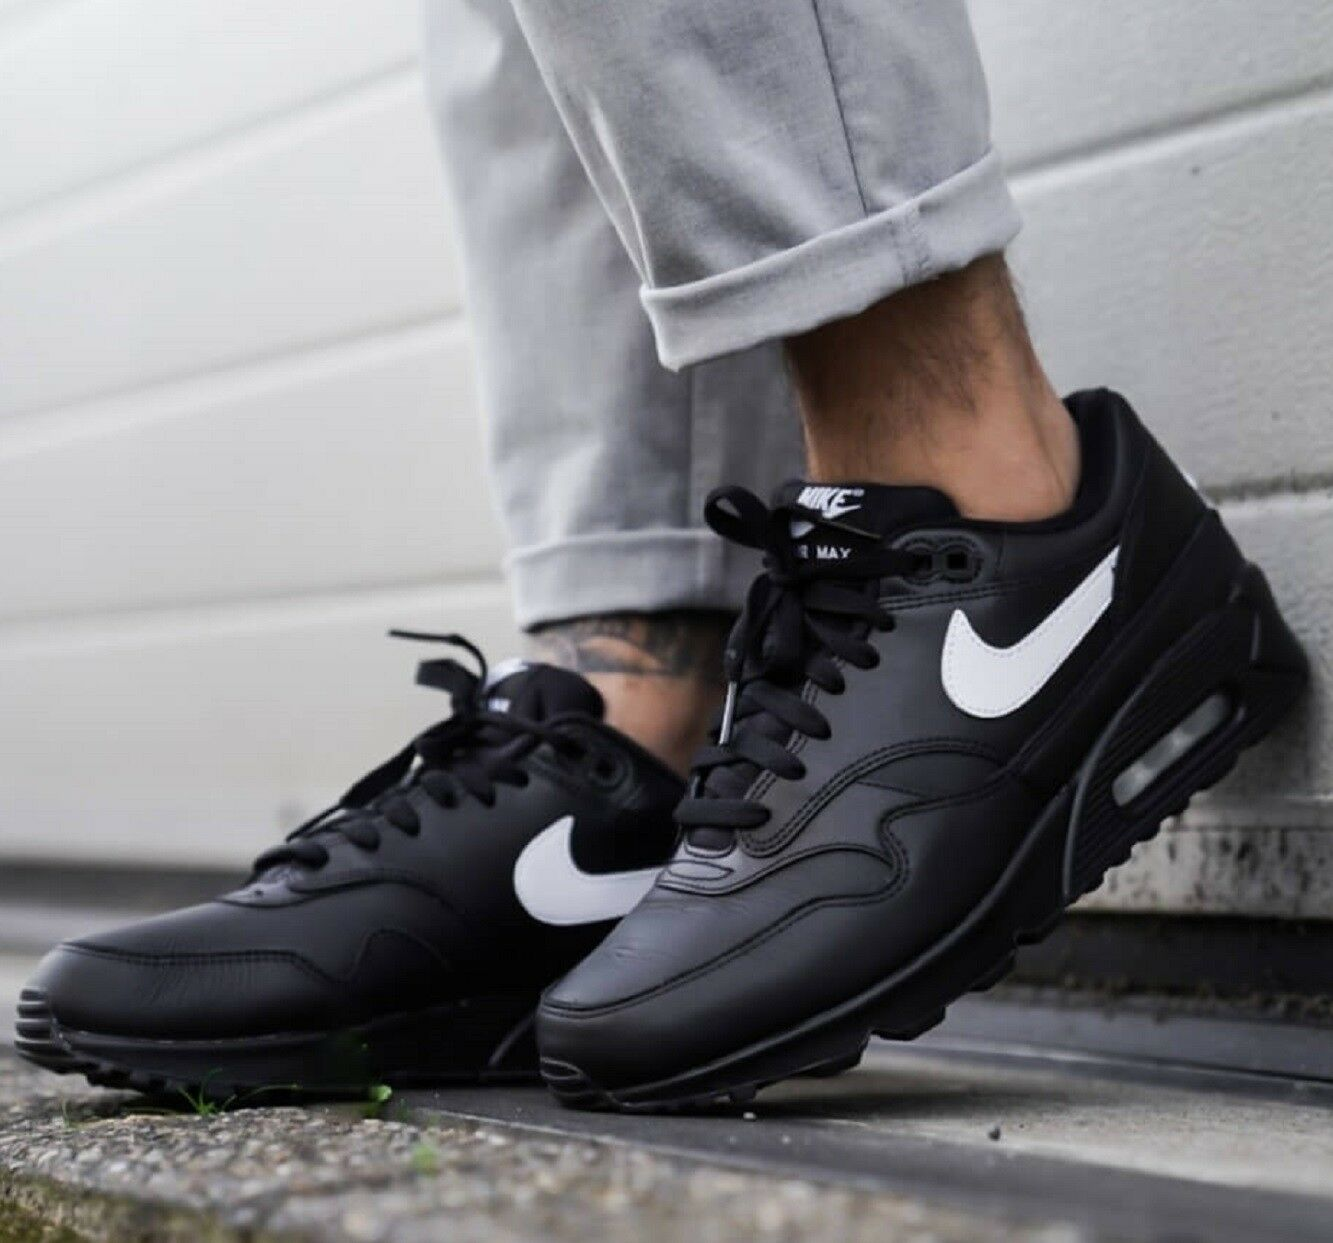 Nike Air Max 90 1 Men's Black White Sneaker Lifestyle shoes